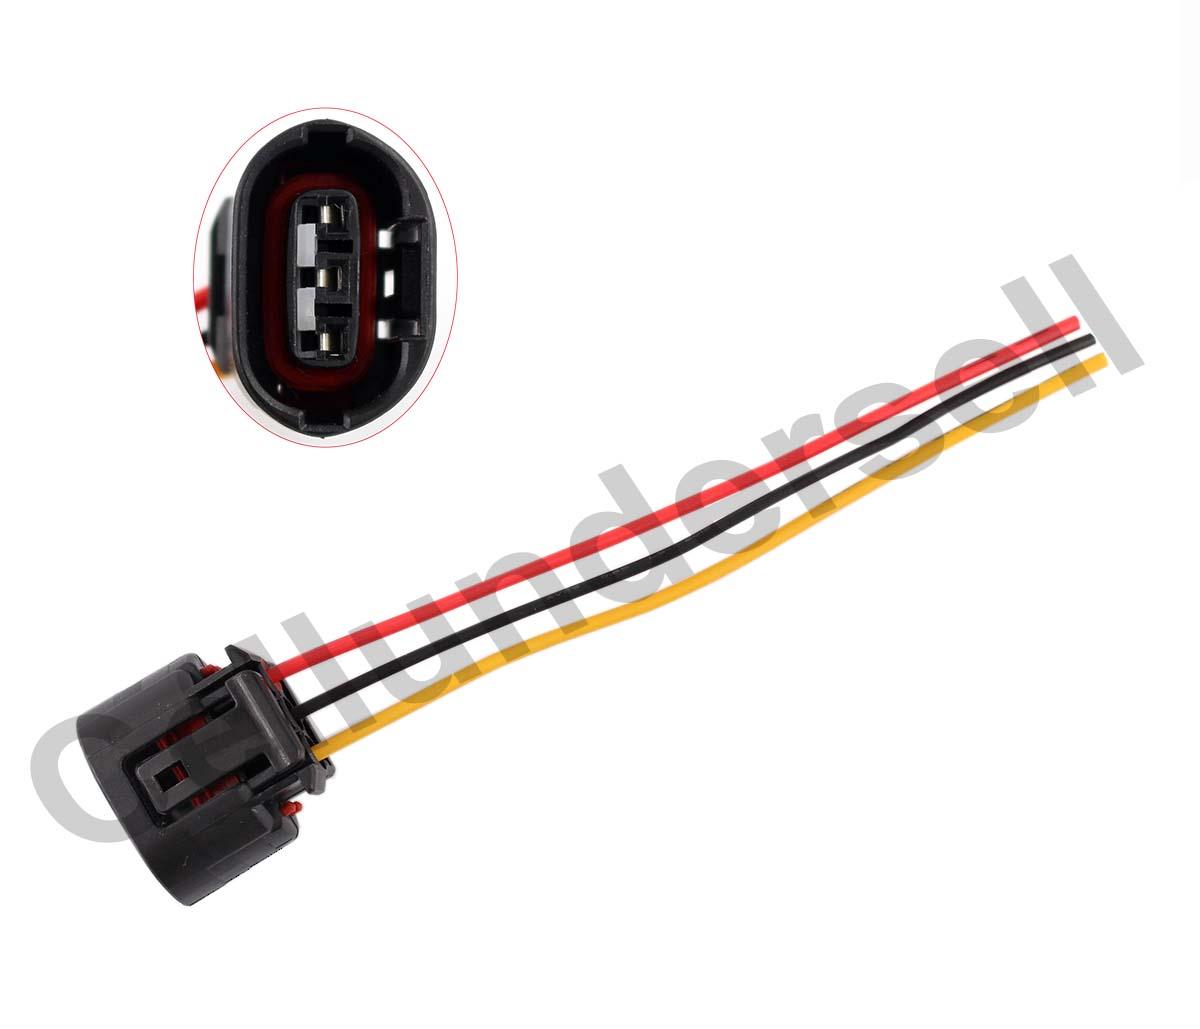 Alternator Repair Plug Harness Connector For Lexus Suzuki Jaguar Toyota Wire